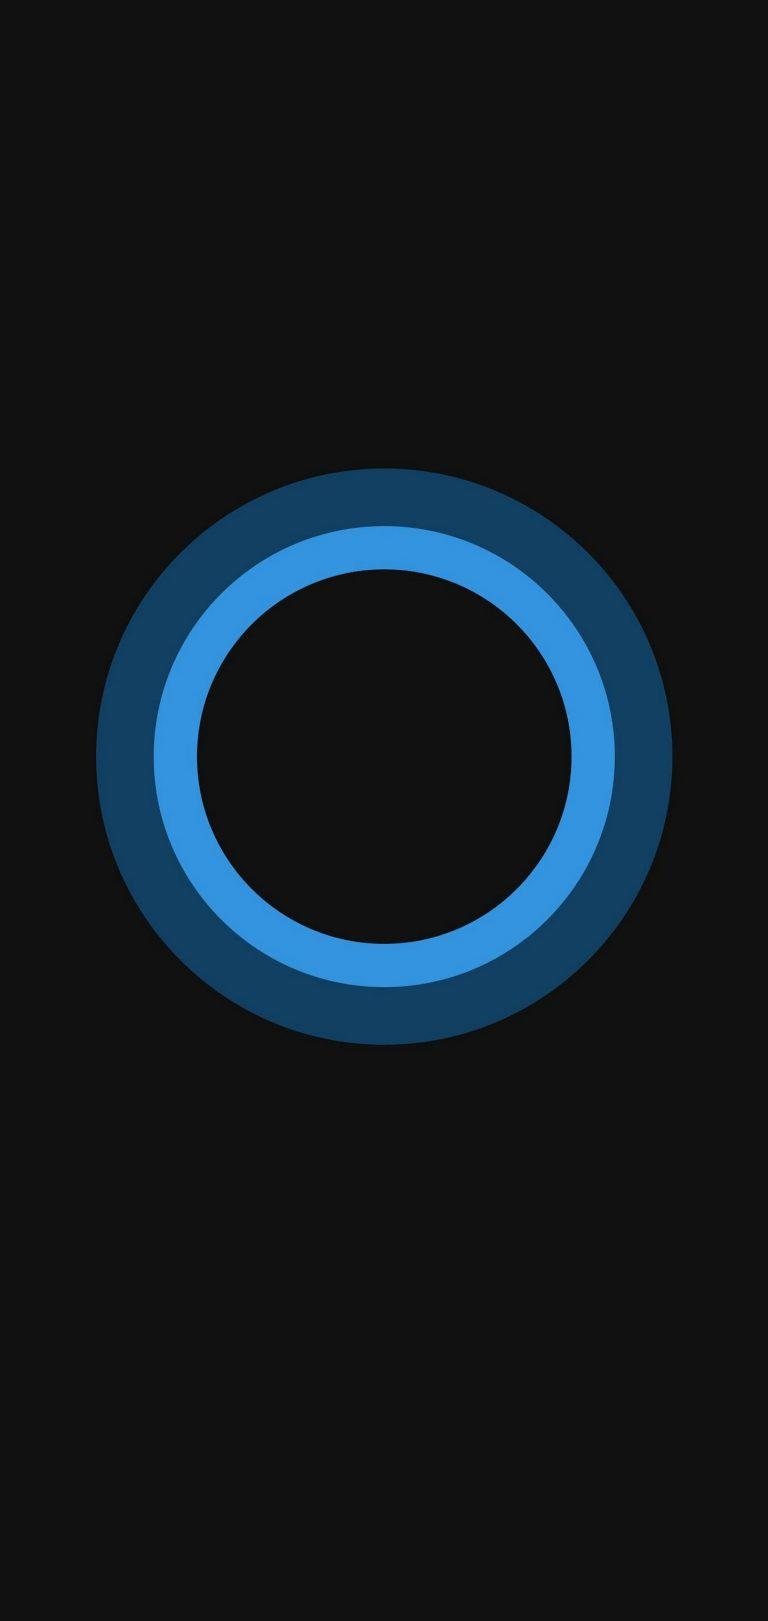 Bluish Circles Minimal Wallpaper 1440x3040 768x1621